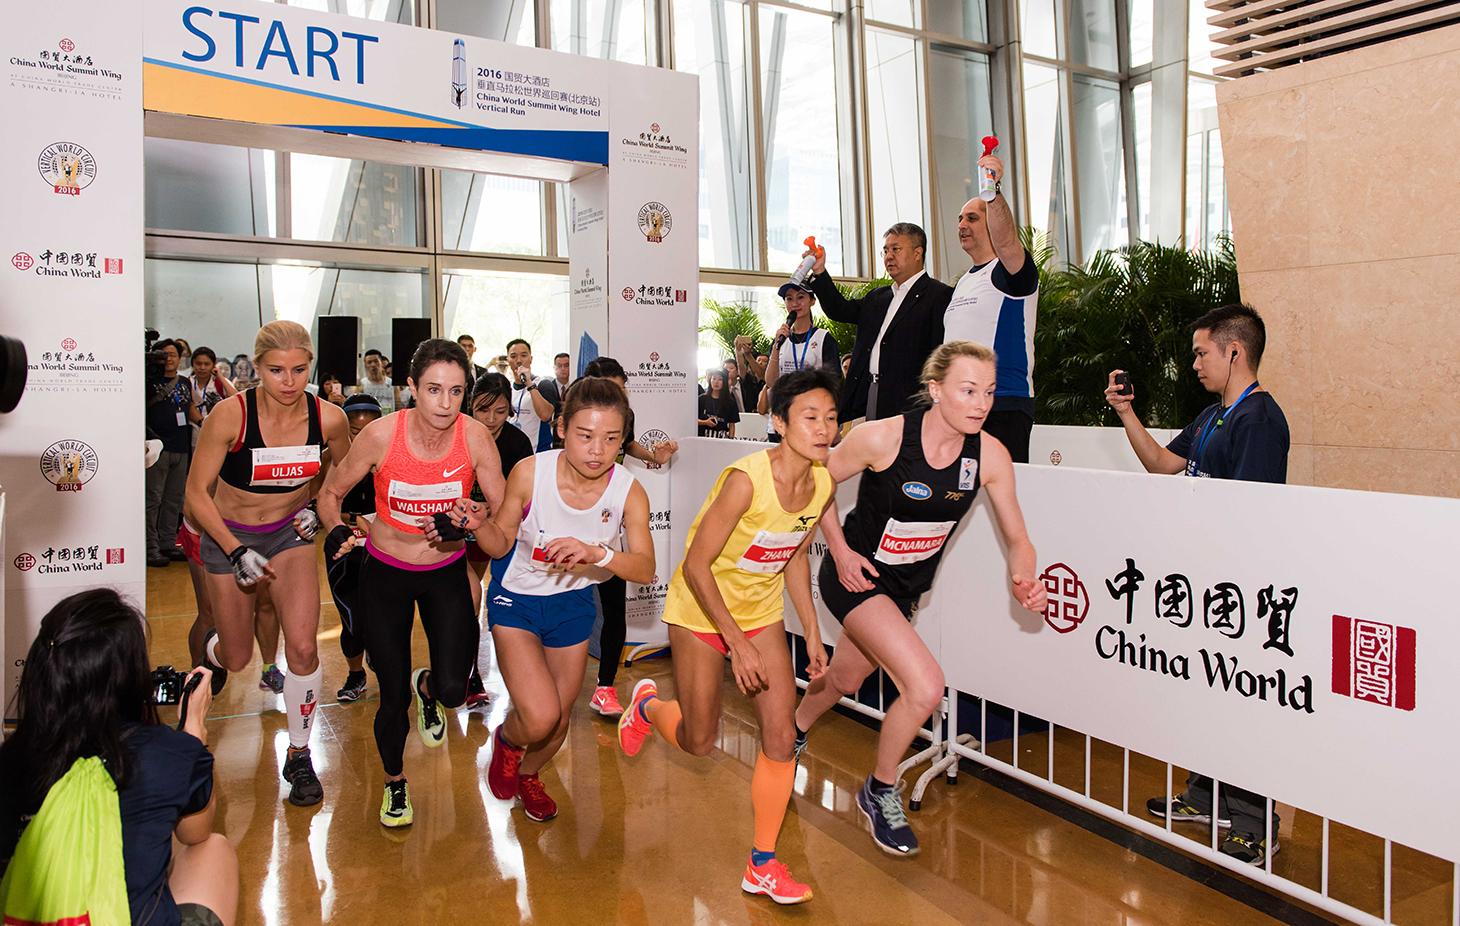 Race start China World Summit Wing Hotel Vertical Run. ©Sporting Republic